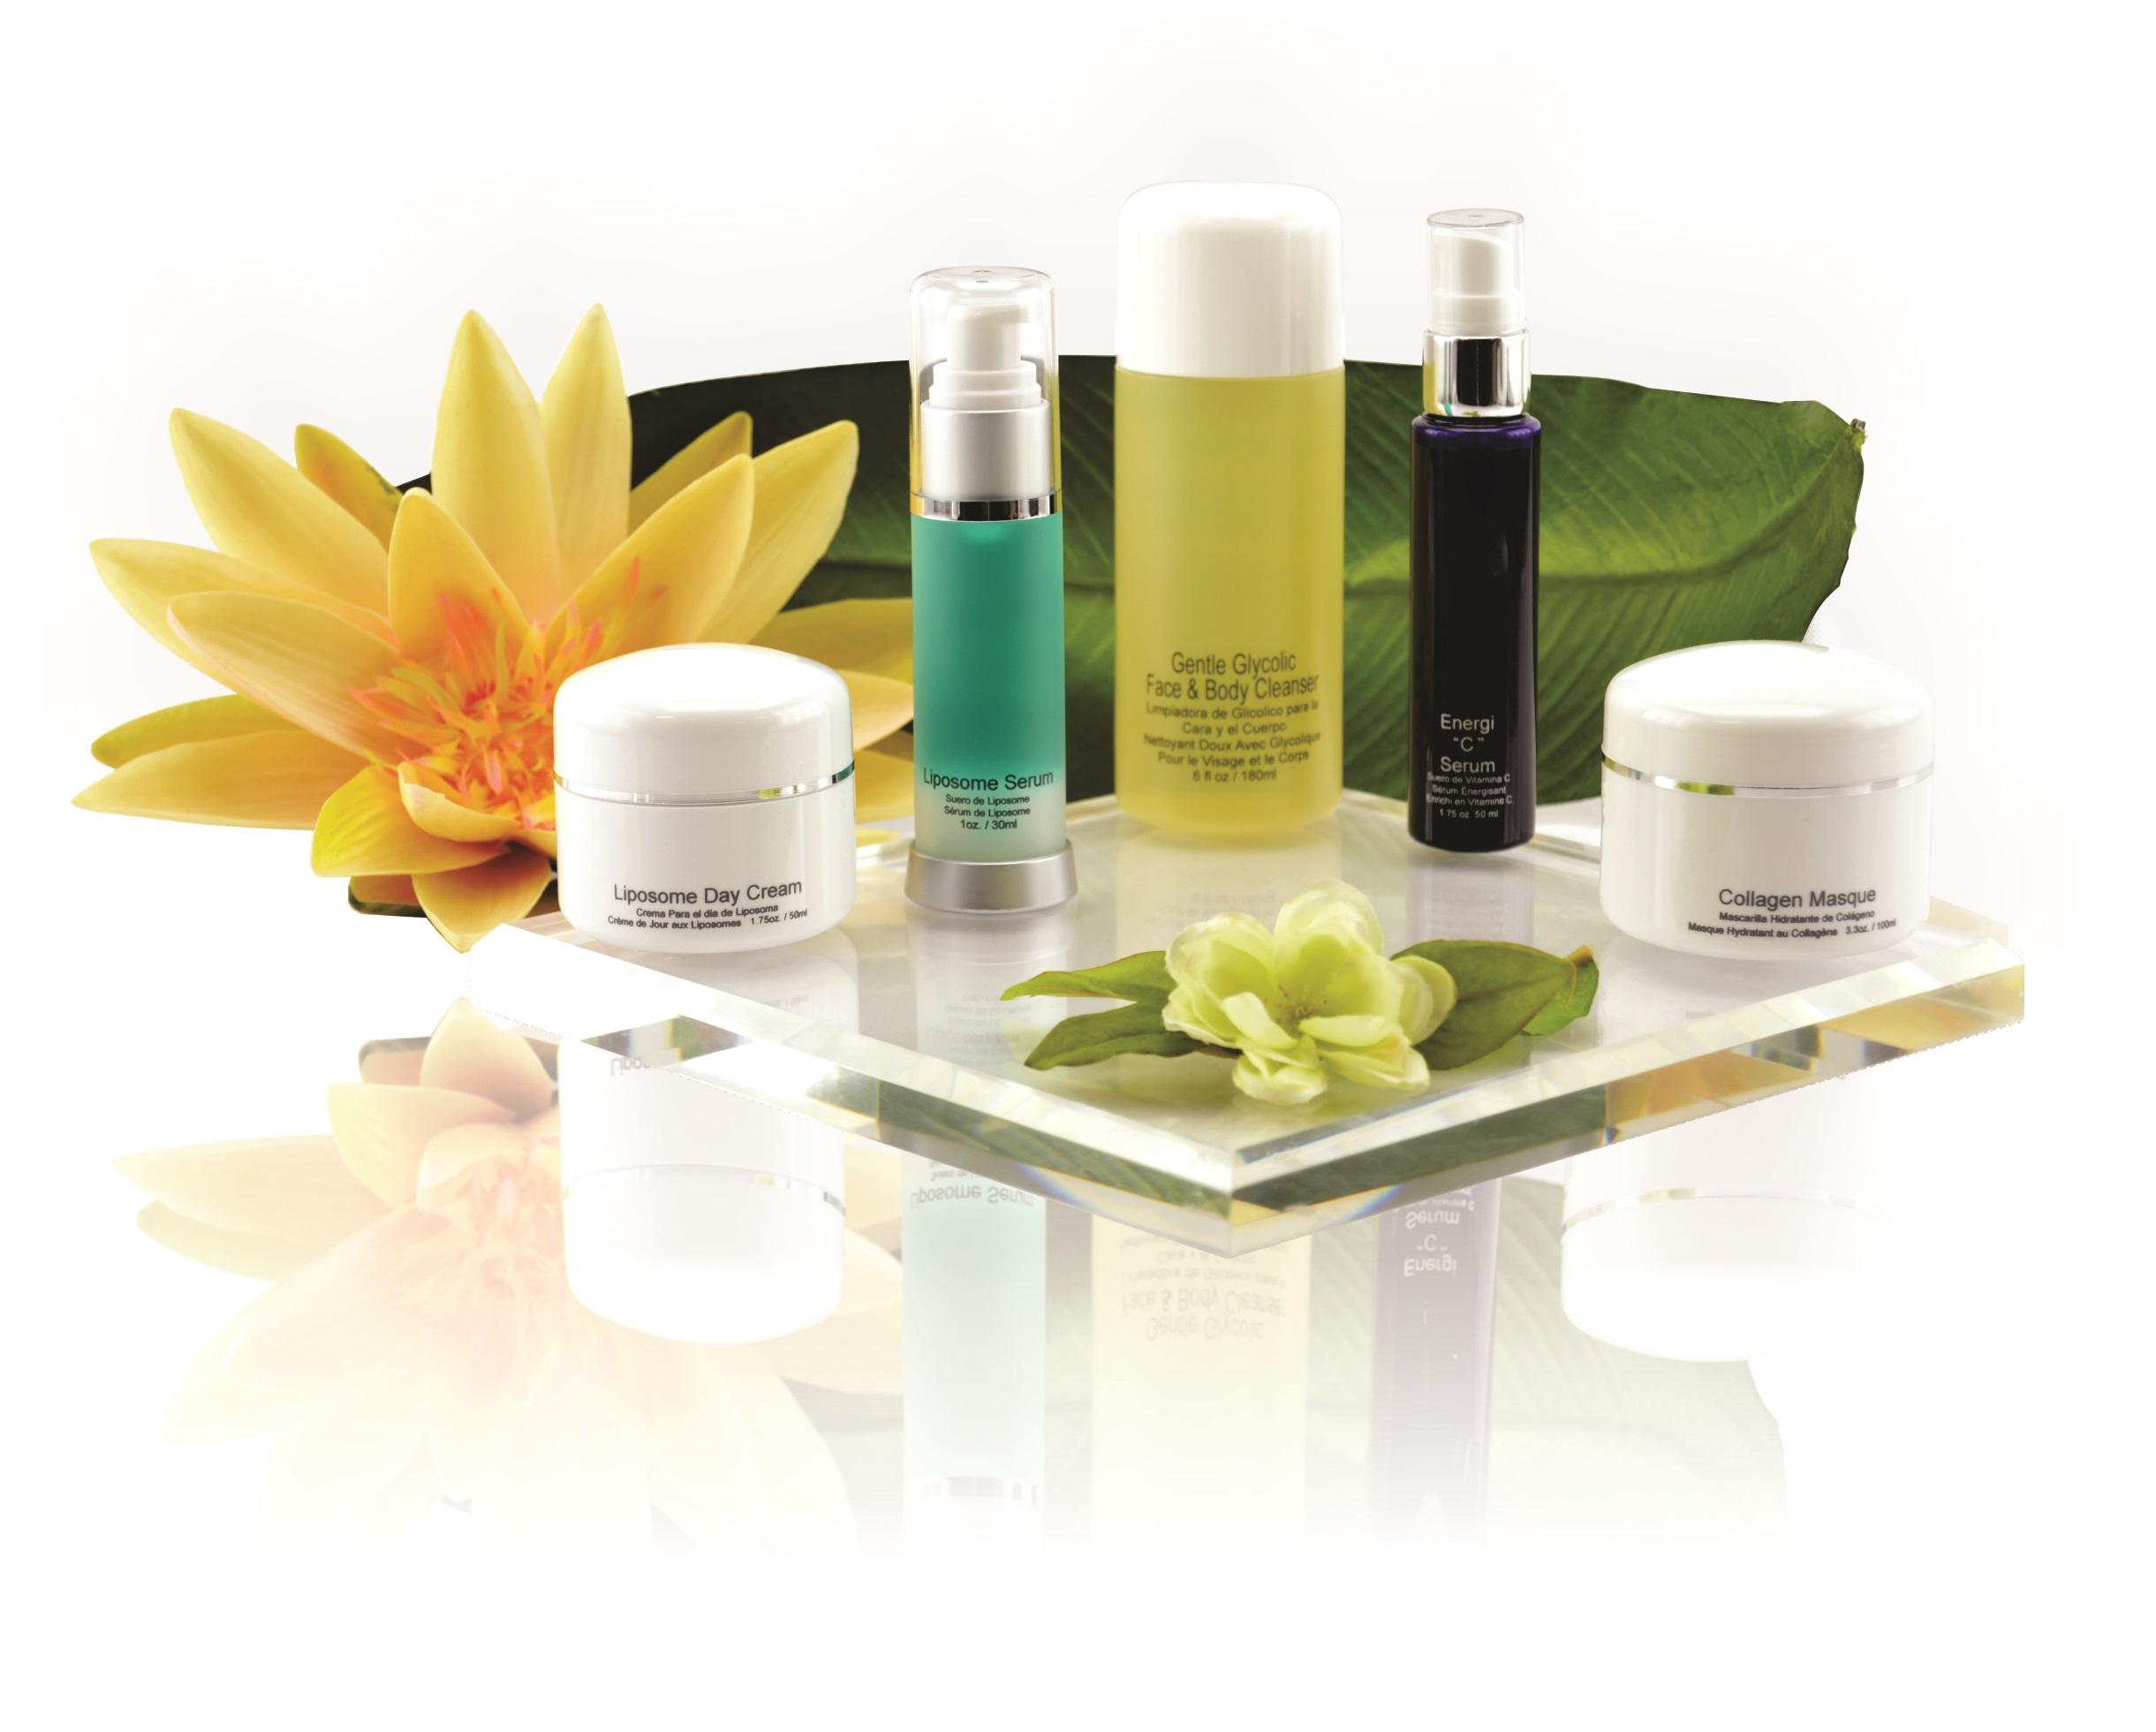 Audrey Morris Cosmetics International Announces Launch of New Skin